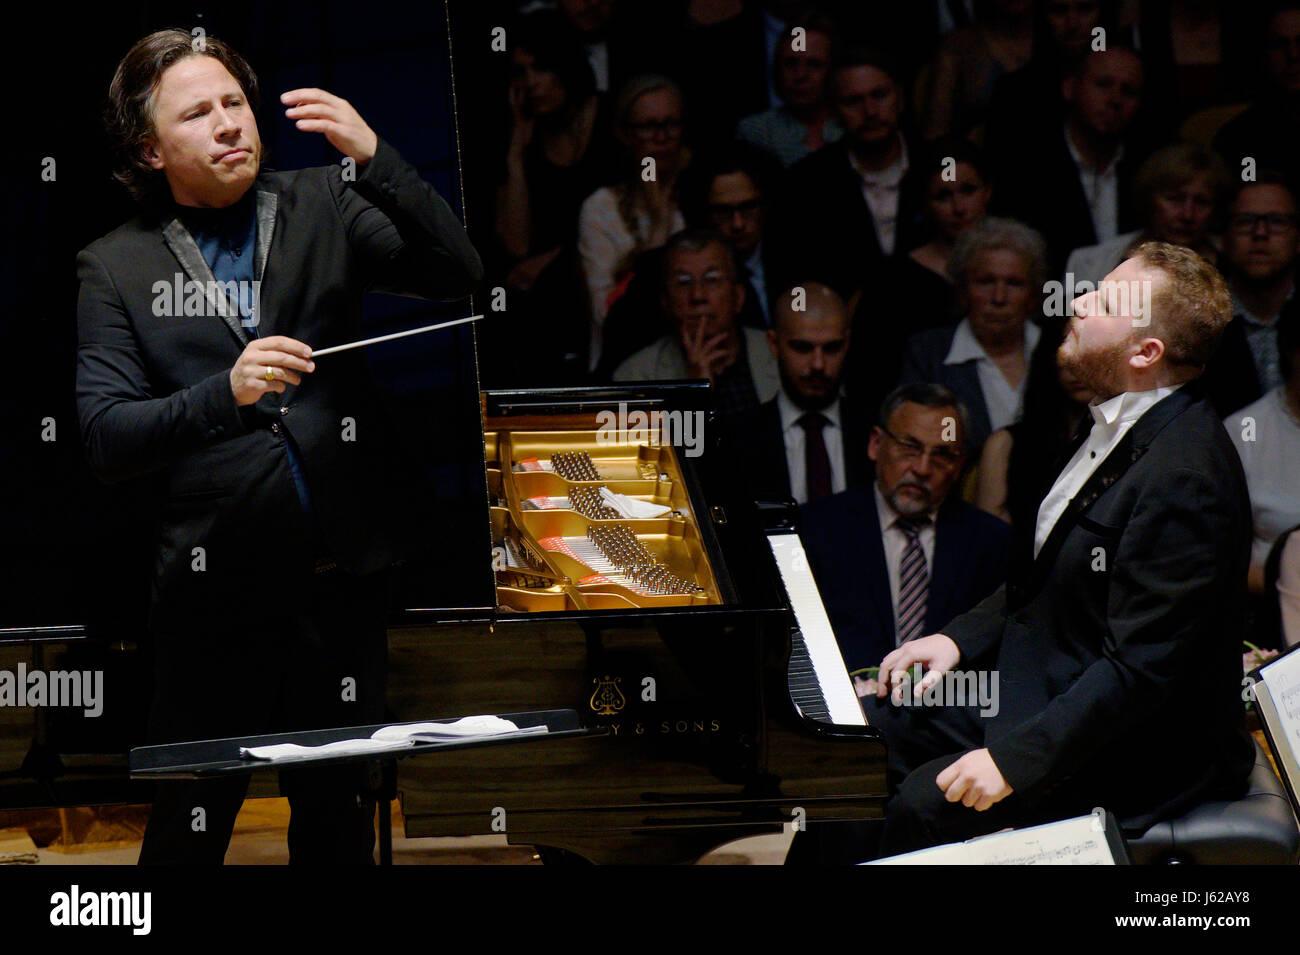 Czech piano player Lukas Vondracek (right) and Estonian conductor Kristjan Jarvi (right) accompanied by the Czech - Stock Image